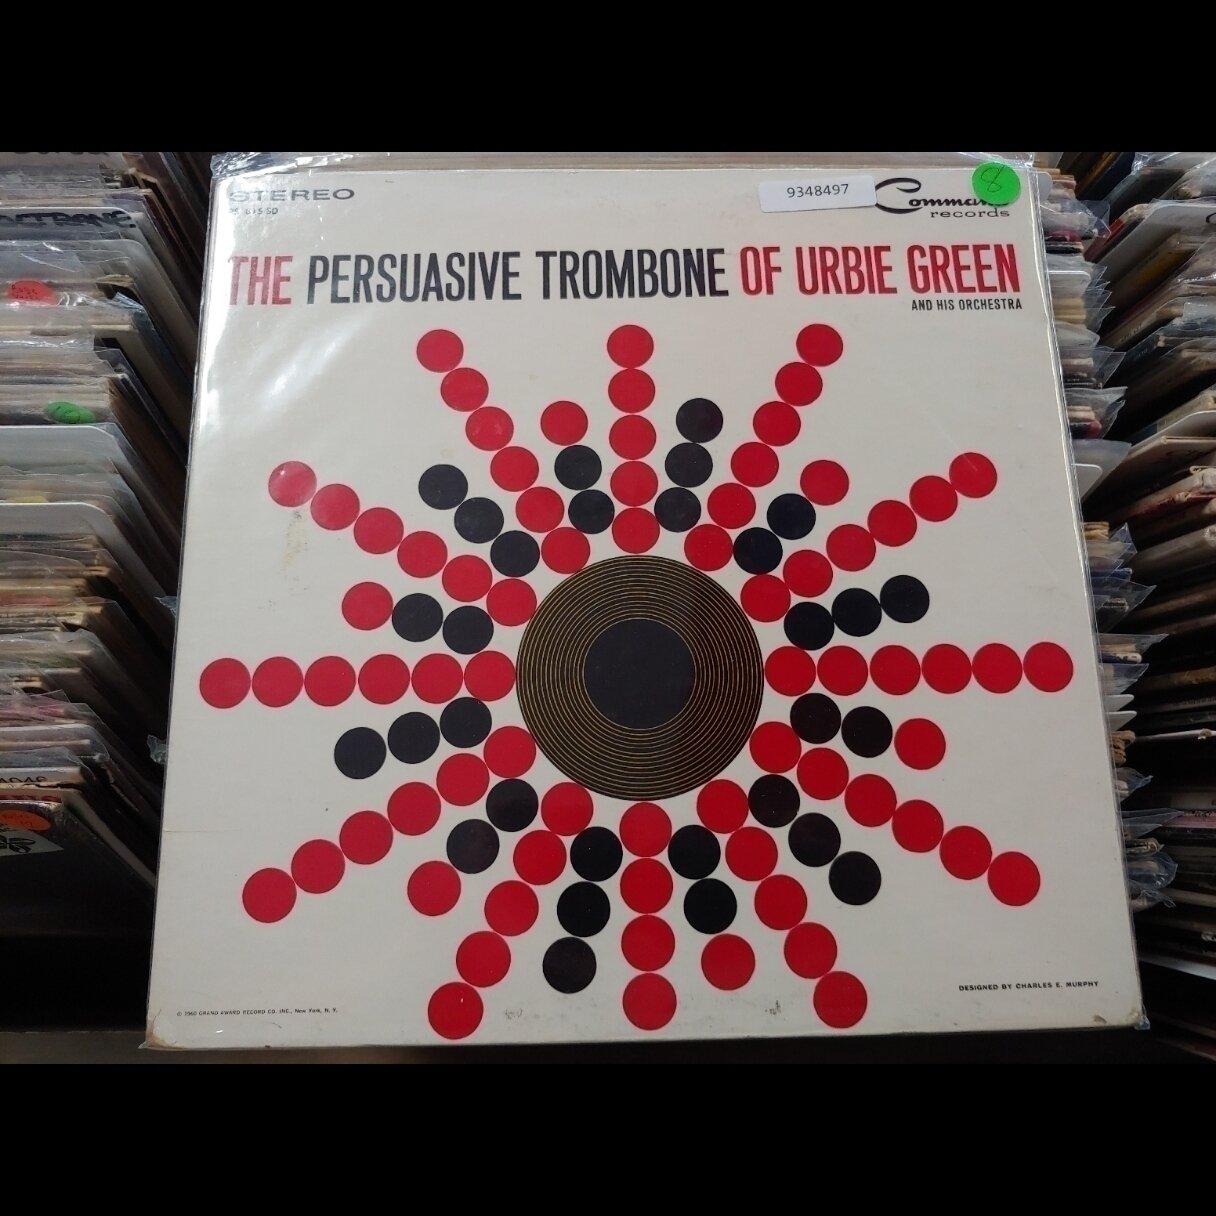 GREEN, URBIE-THE PERSUASIVE TROMBONE OF URBIE GREEN AND HIS ORCHESTRA